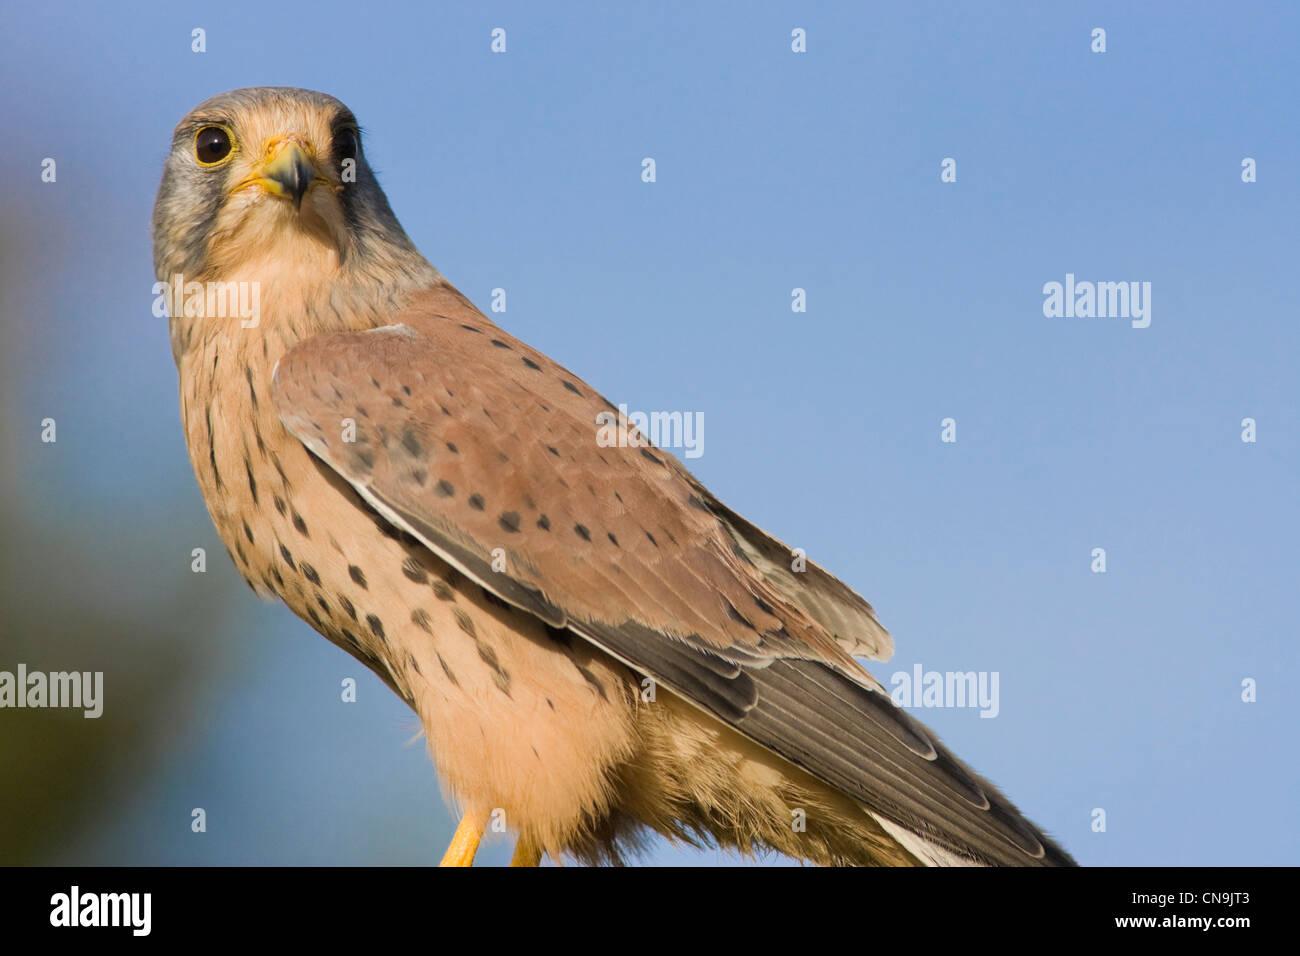 Common Kestrel - Falco tinnunculus - Stock Image